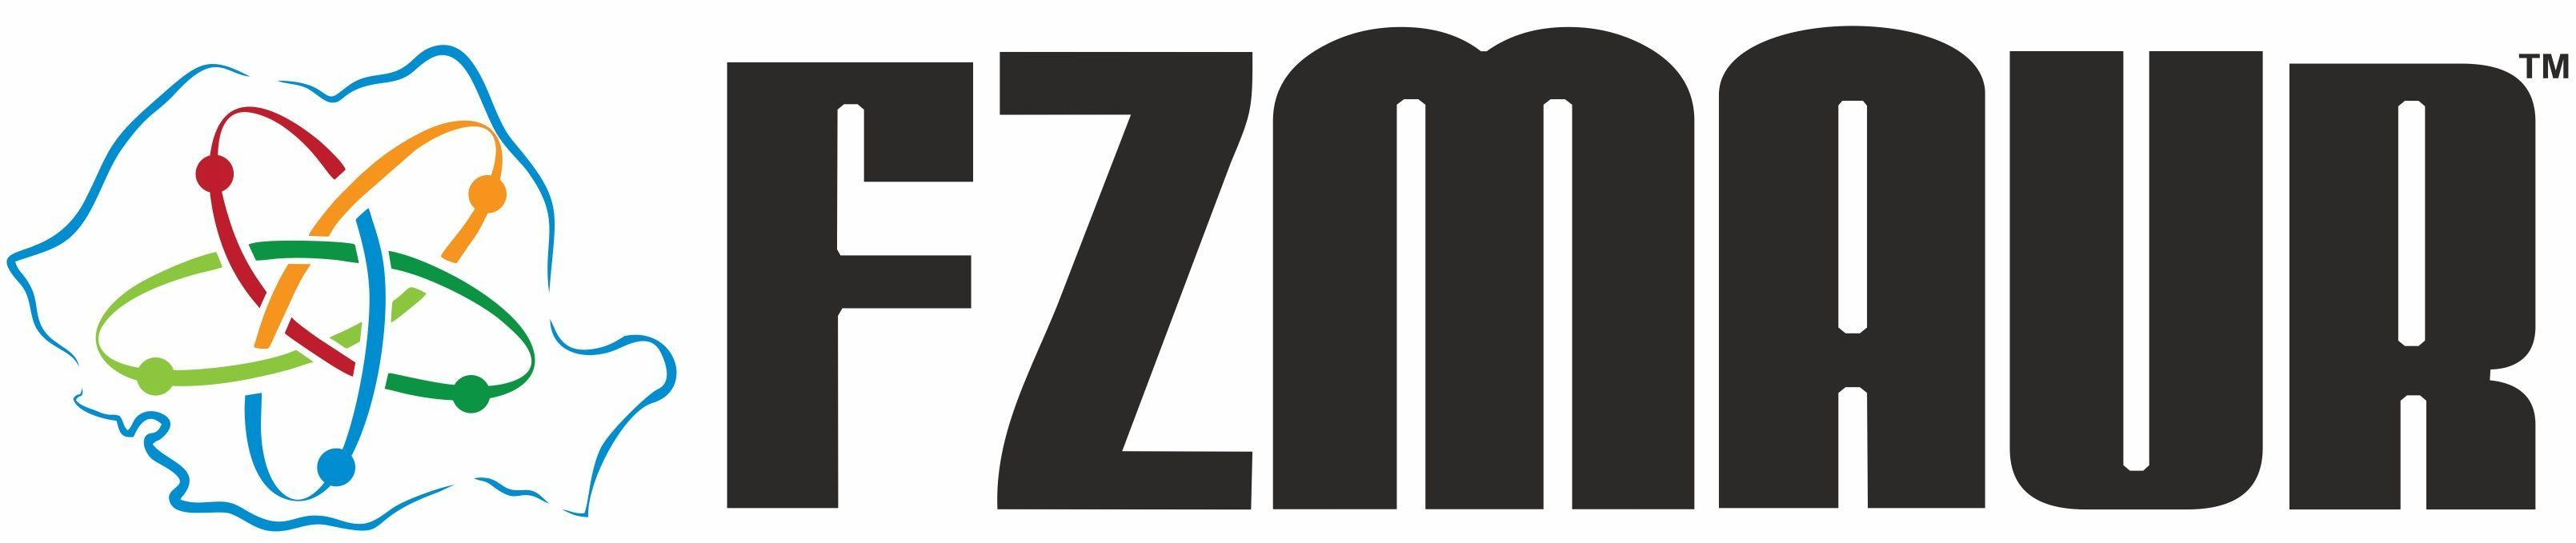 cropped-cropped-cropped-fzmaur-logo-site.jpg